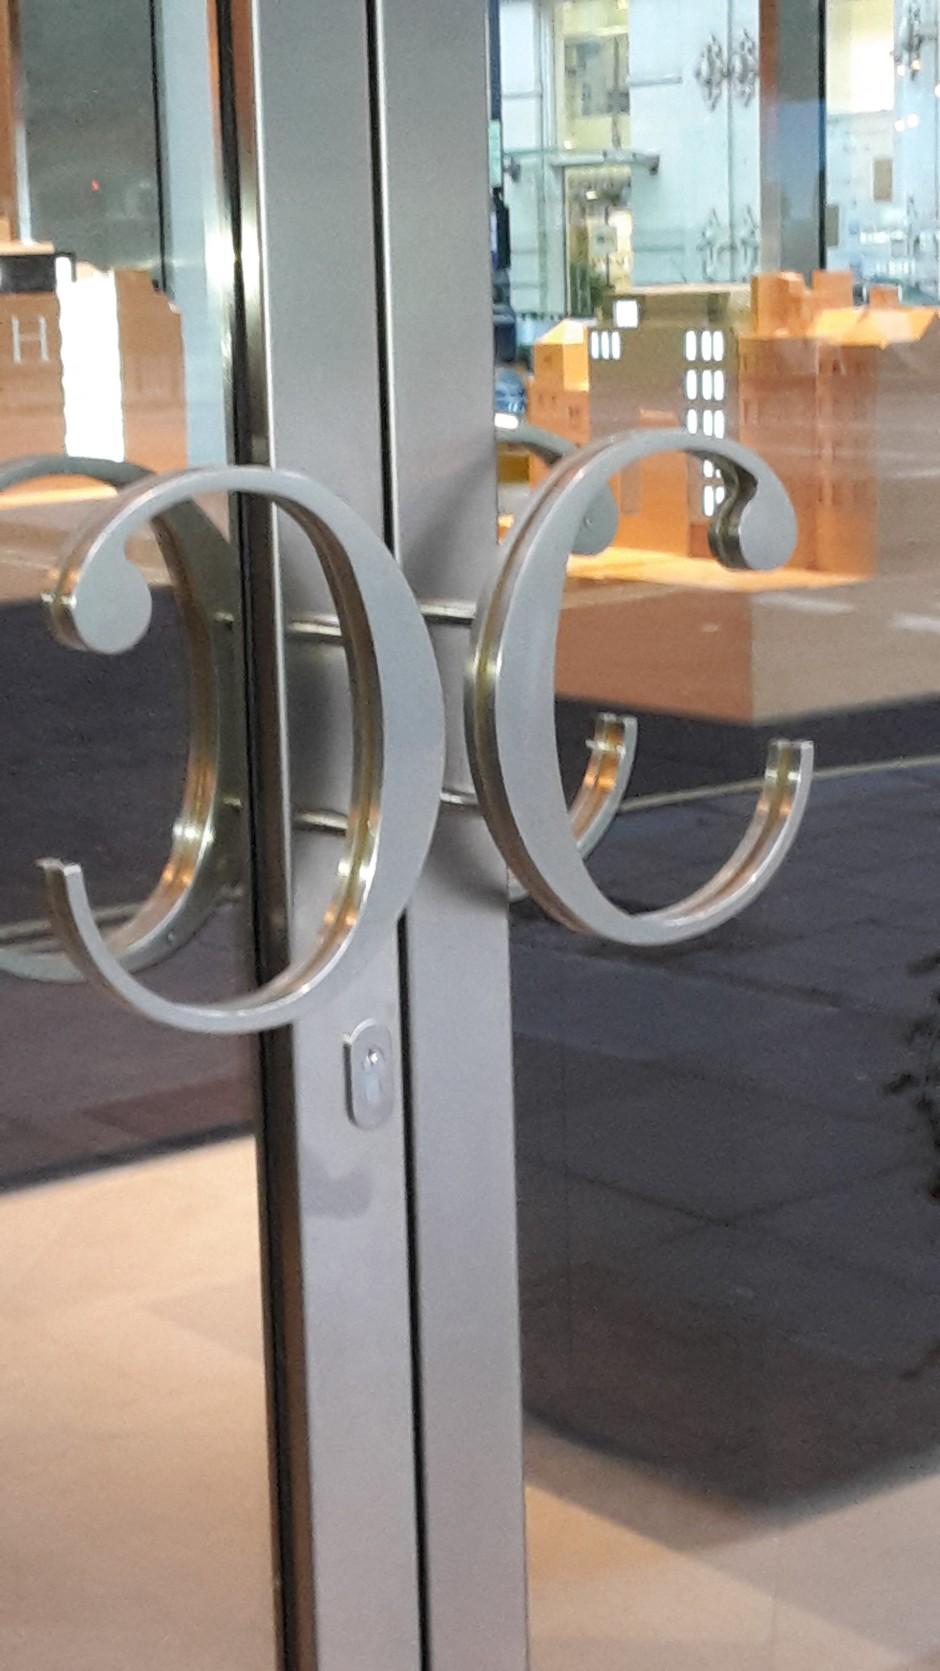 Bespoke formed handles